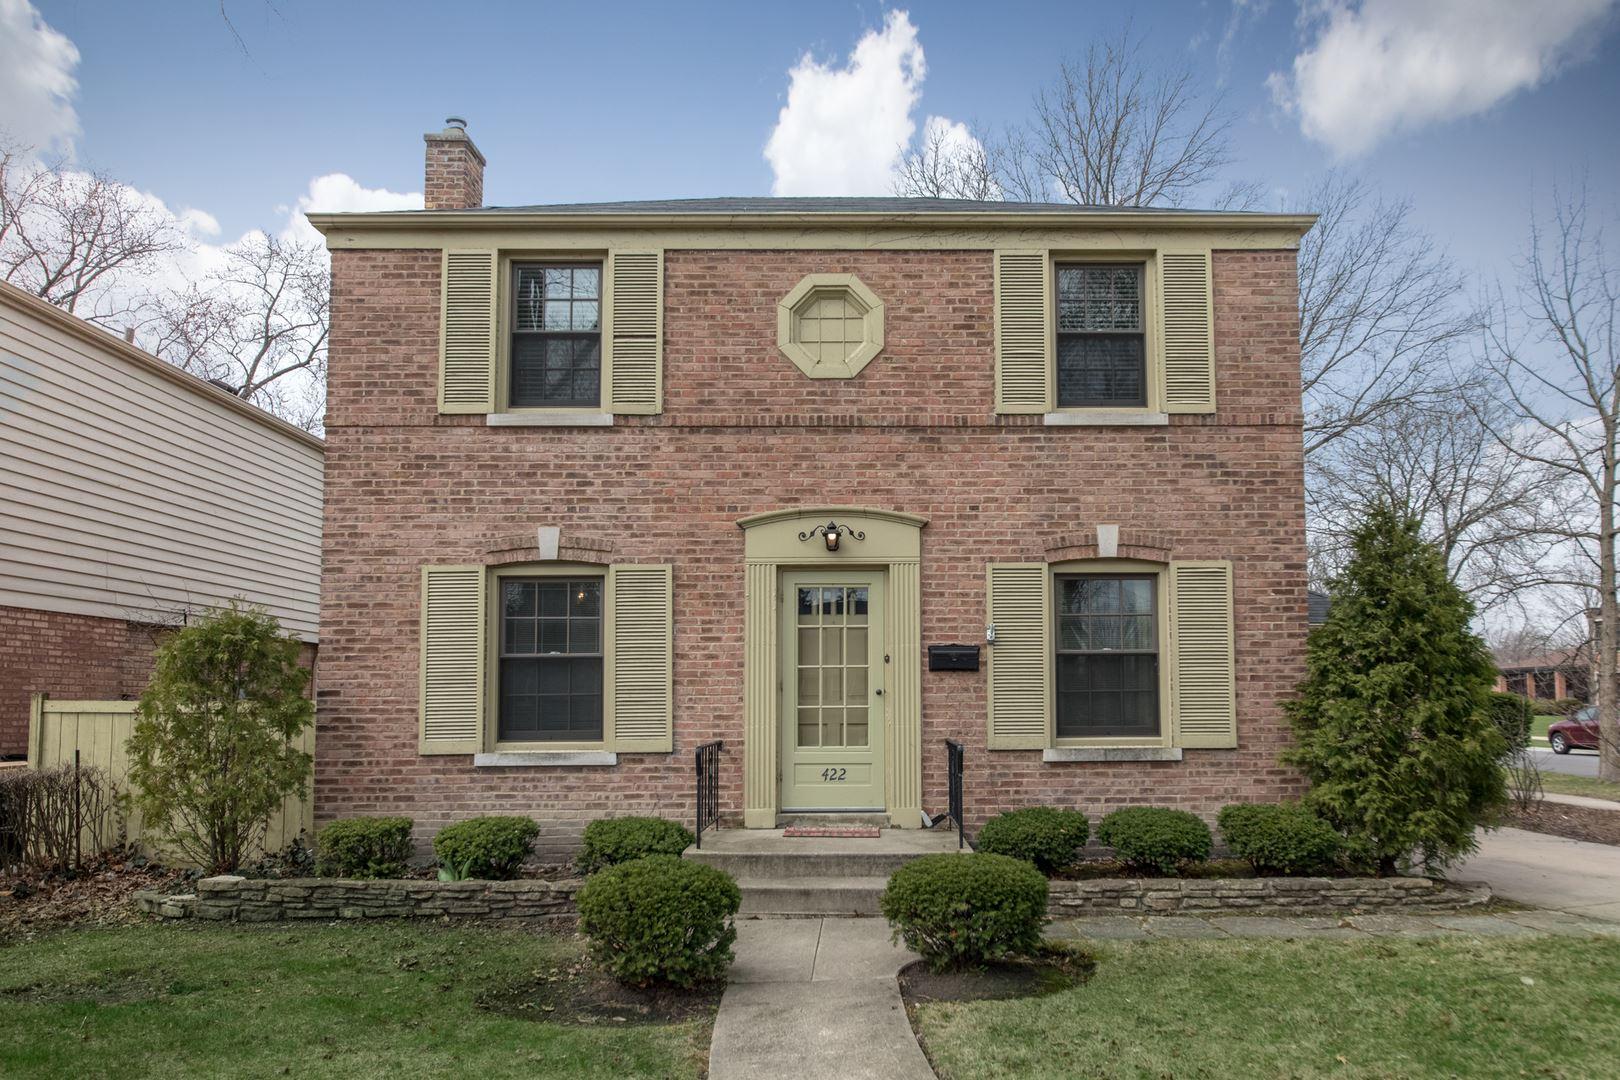 422 S Western Avenue, Park Ridge, IL 60068 - #: 10728265